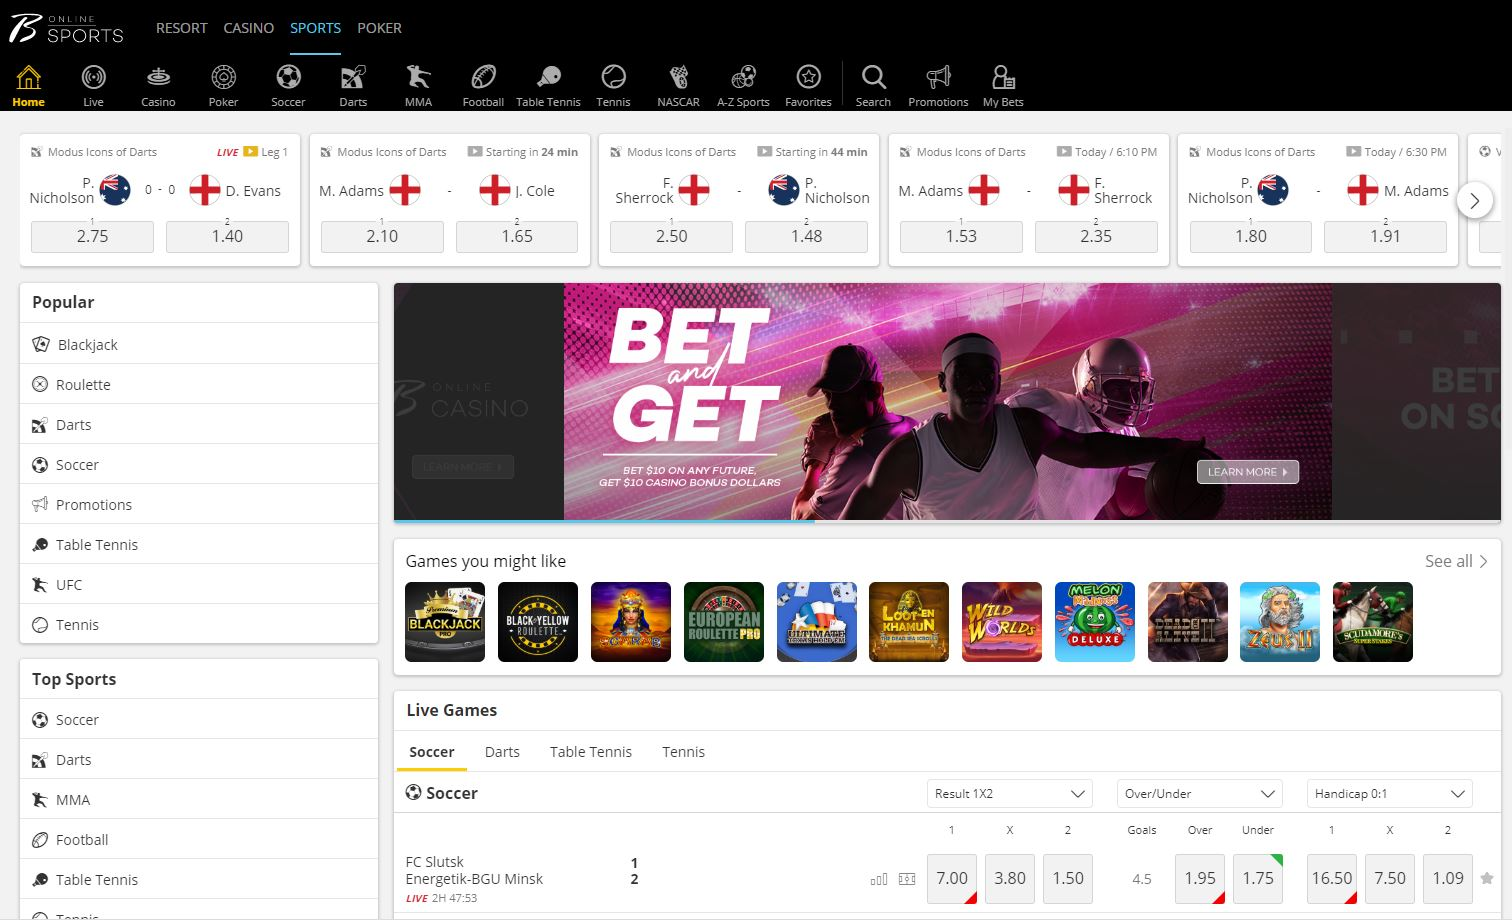 borgata casino sportsbook